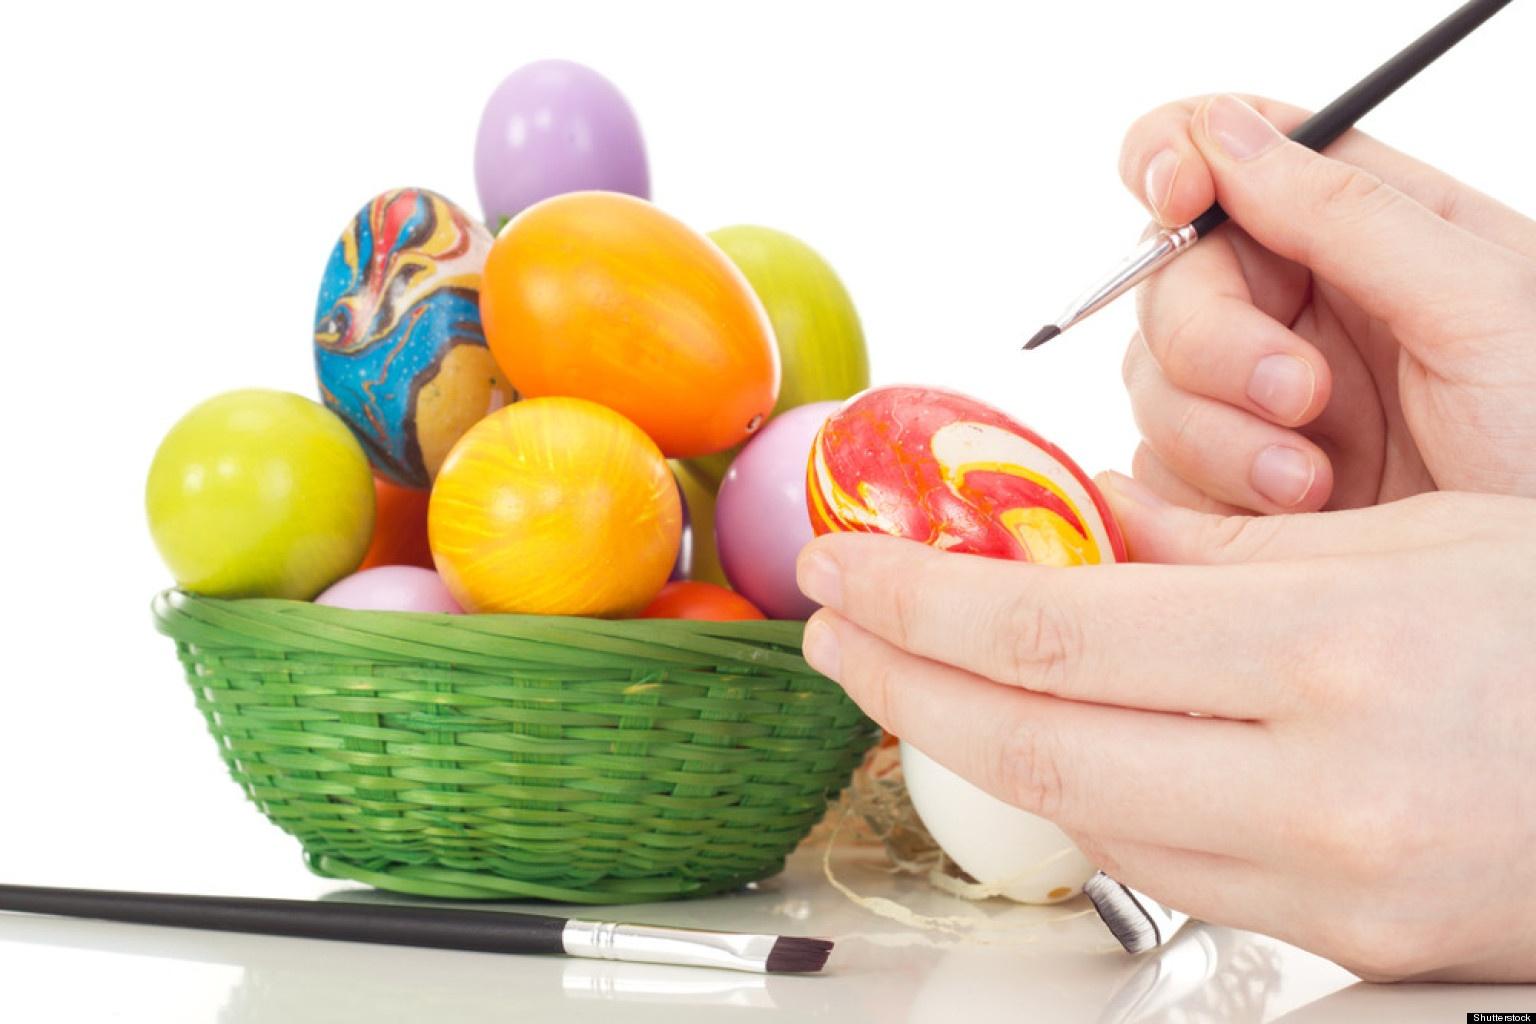 o-easter-egg-decorating-ideas-facebook